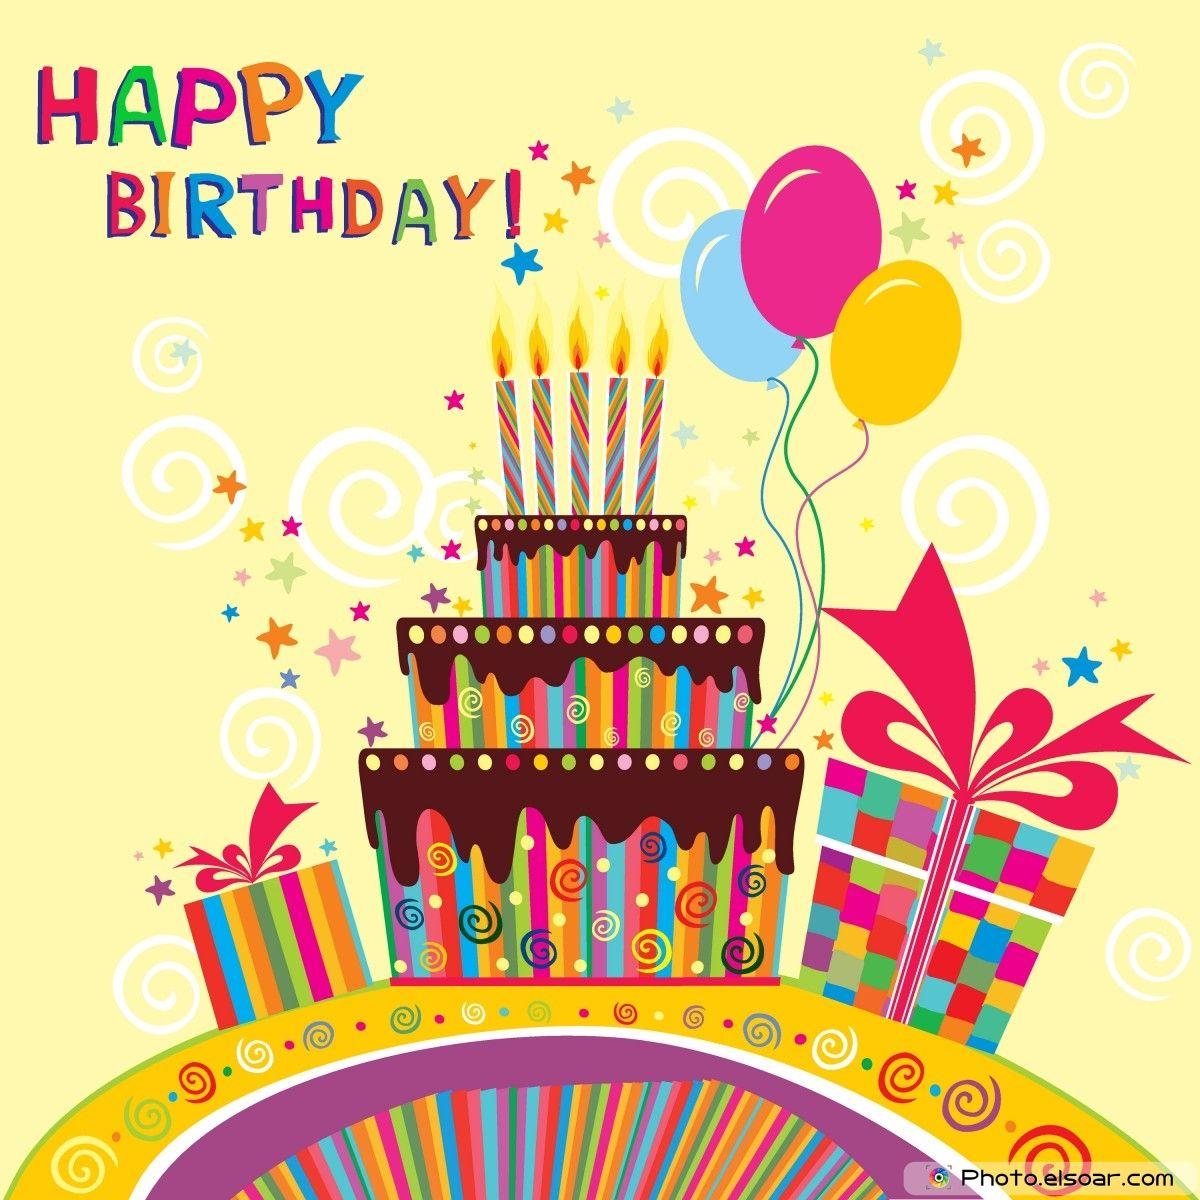 Happy Birthday Superb Greeting Cardp 10 Happy Birthday G Cards